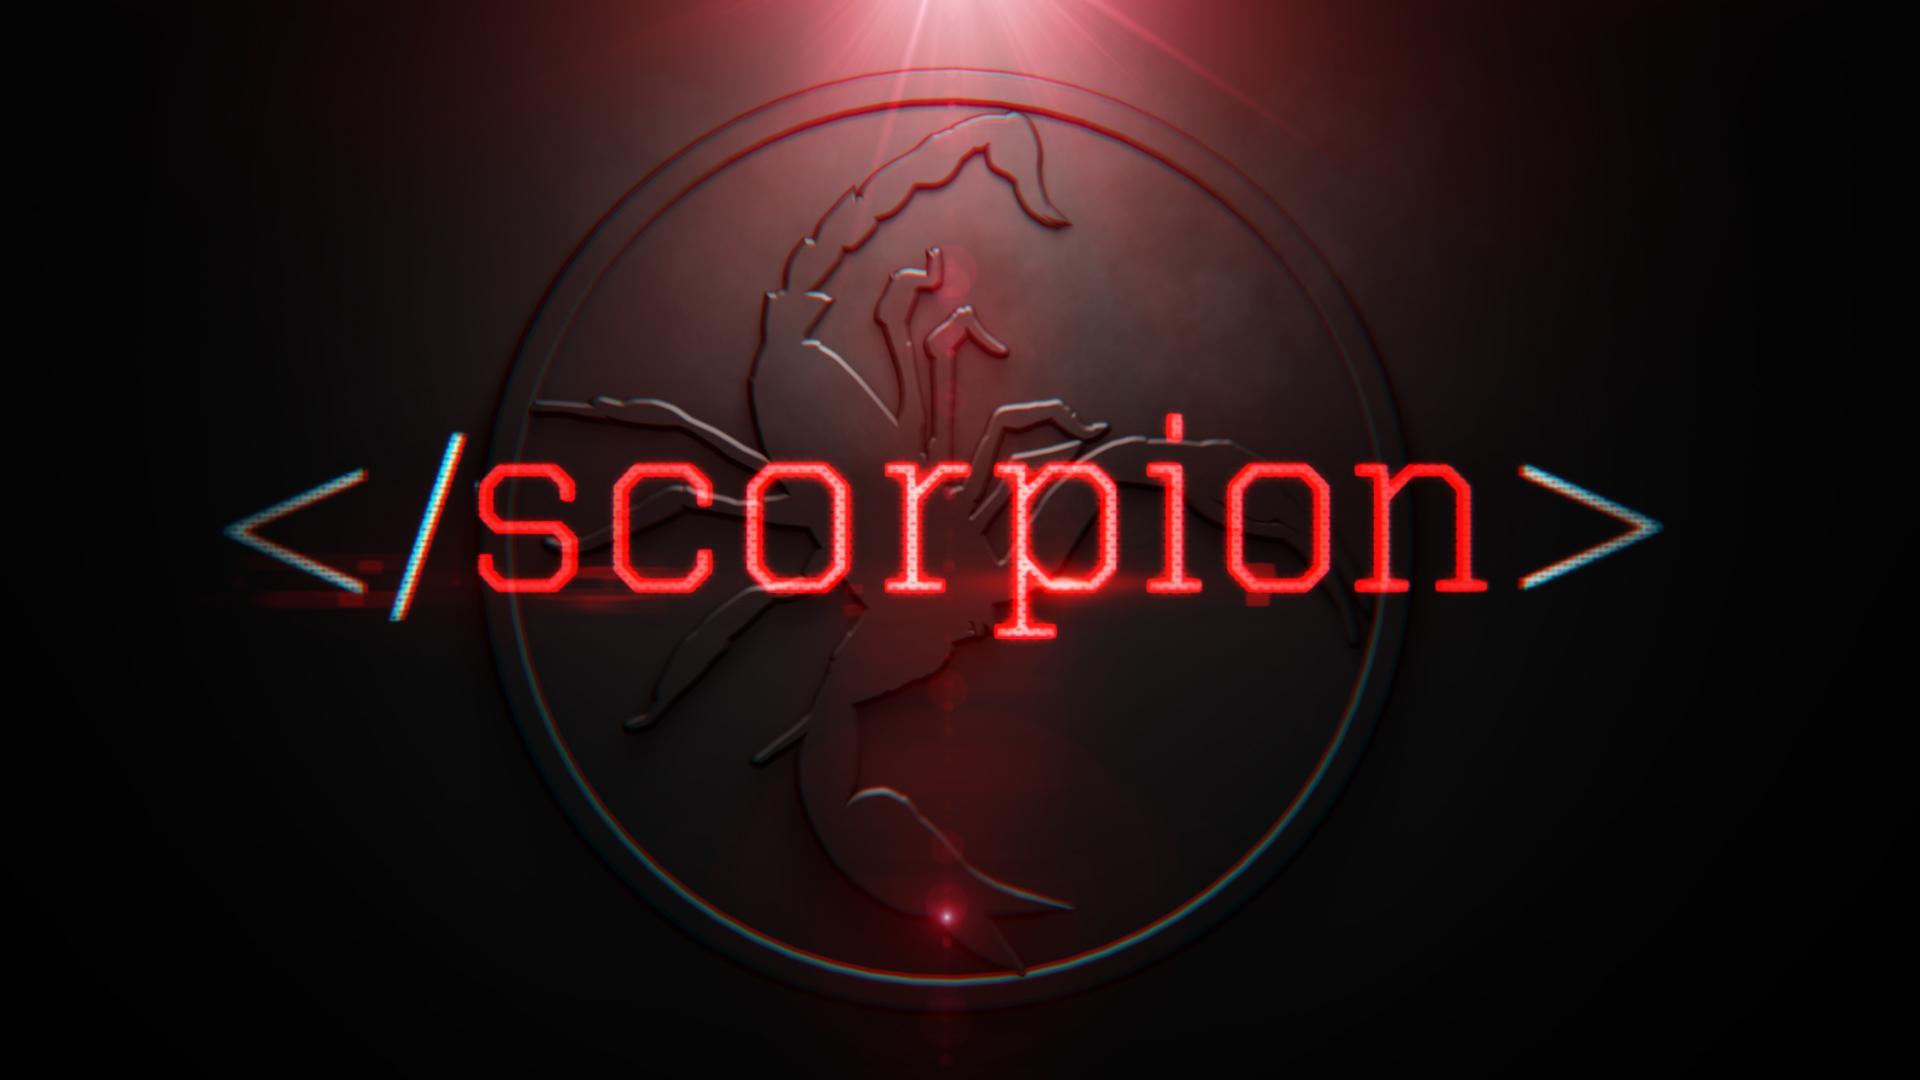 Scorpion Show Logos